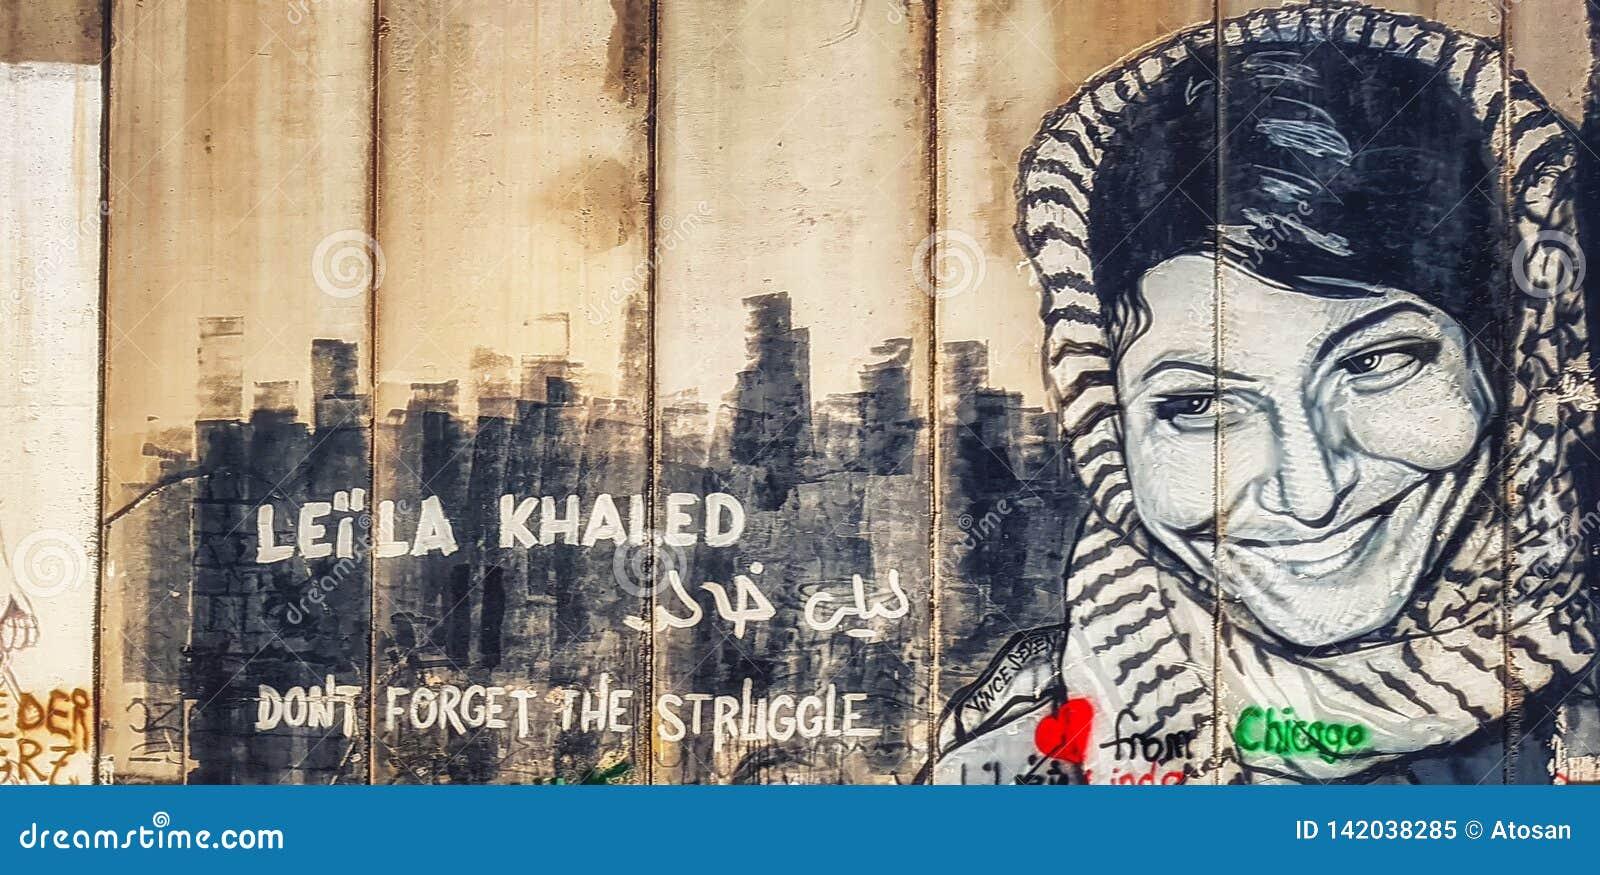 Graffiti di Leila Khaled